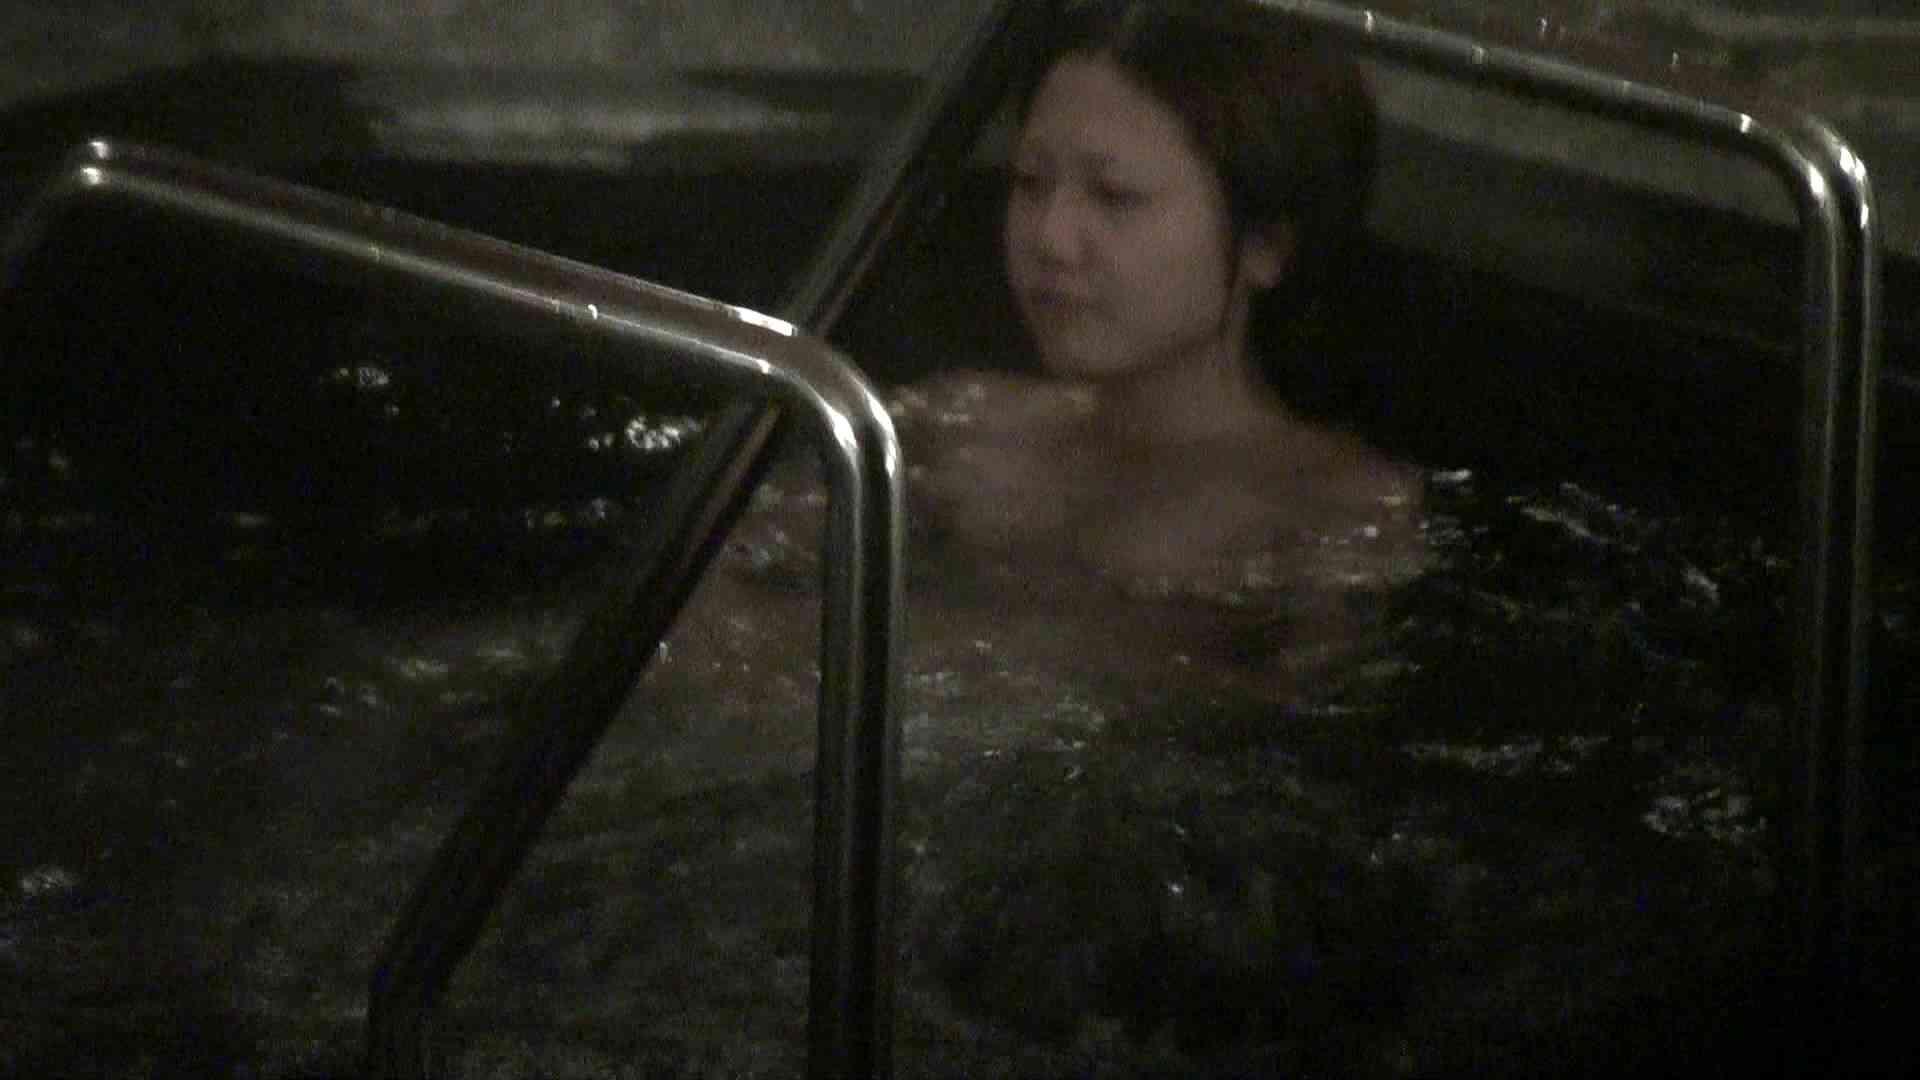 Aquaな露天風呂Vol.411 OLのエロ生活   露天風呂  79連発 67